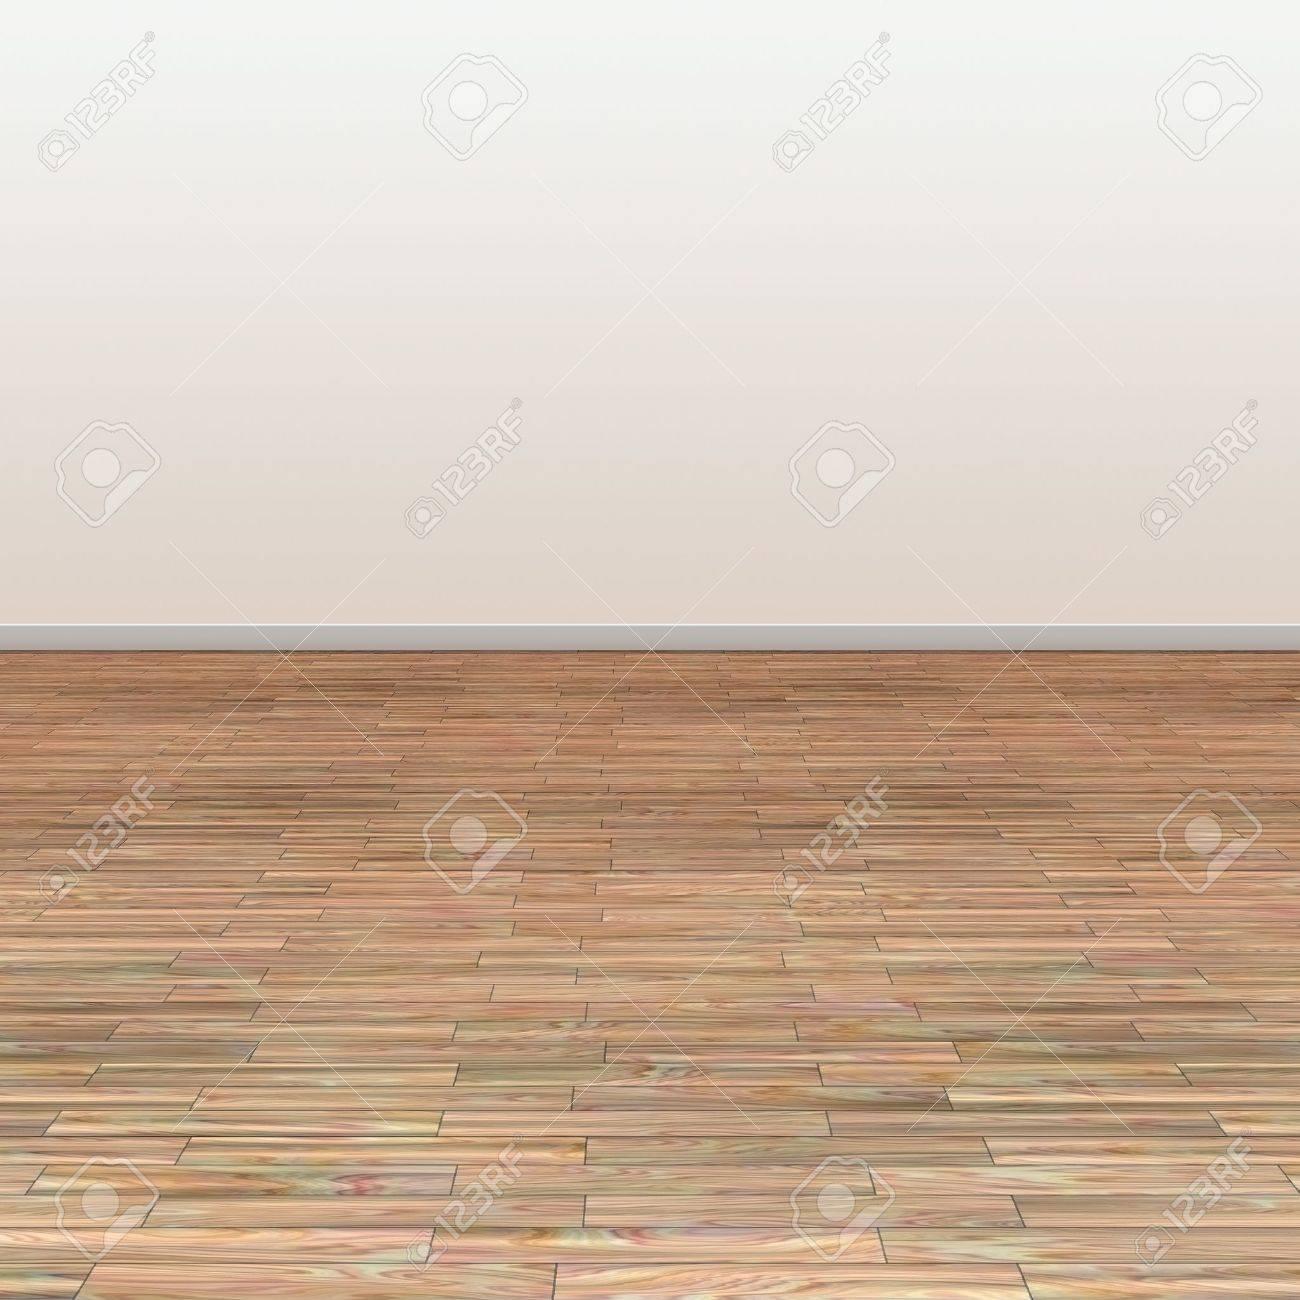 An image of a beautiful hardwood floor background Stock Photo - 7912247